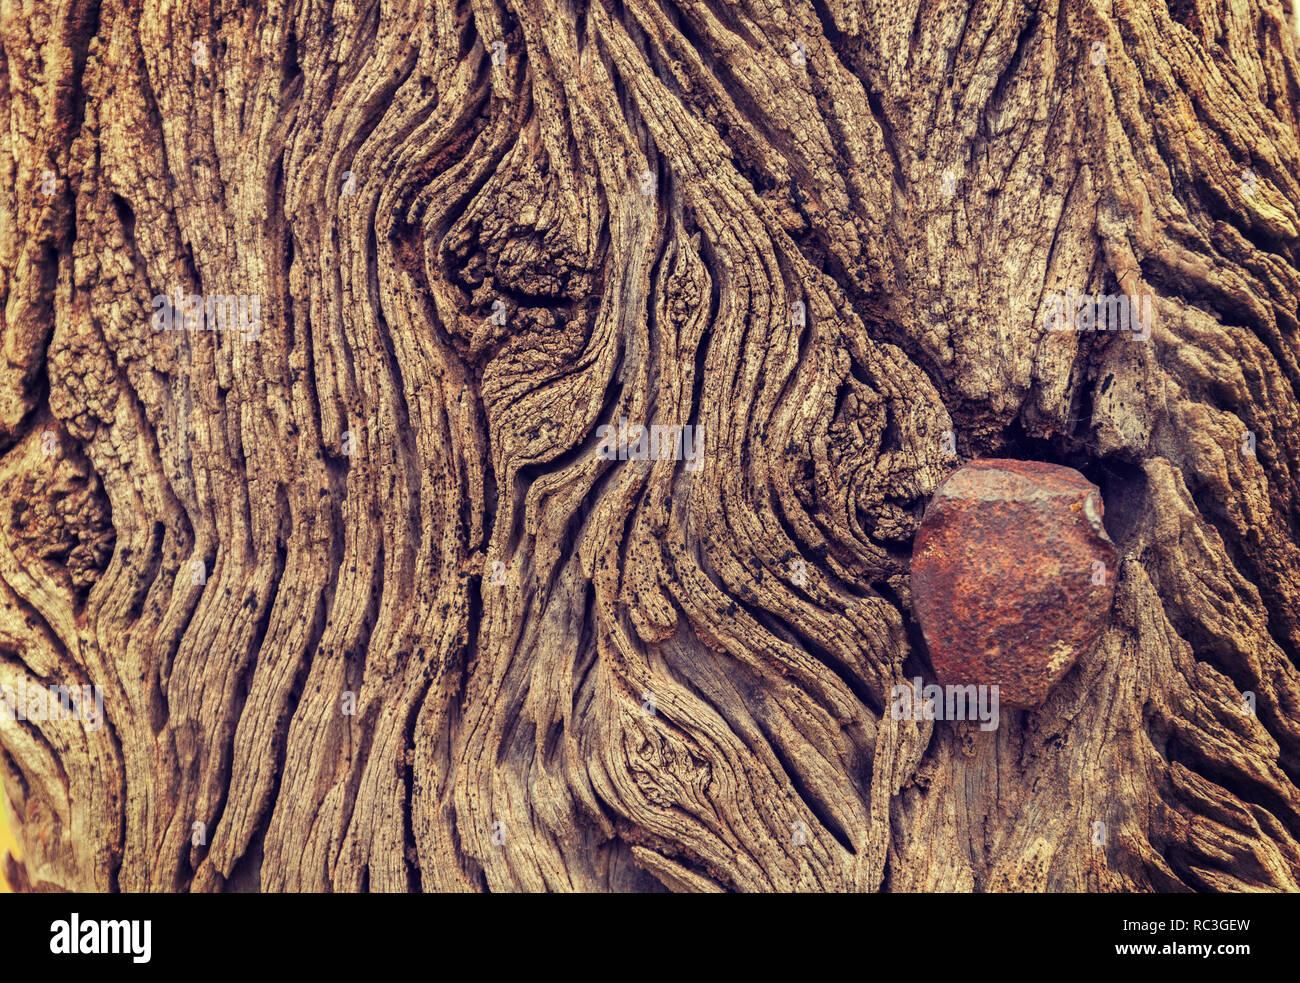 Wooden Sleeper Stock Photos & Wooden Sleeper Stock Images - Alamy